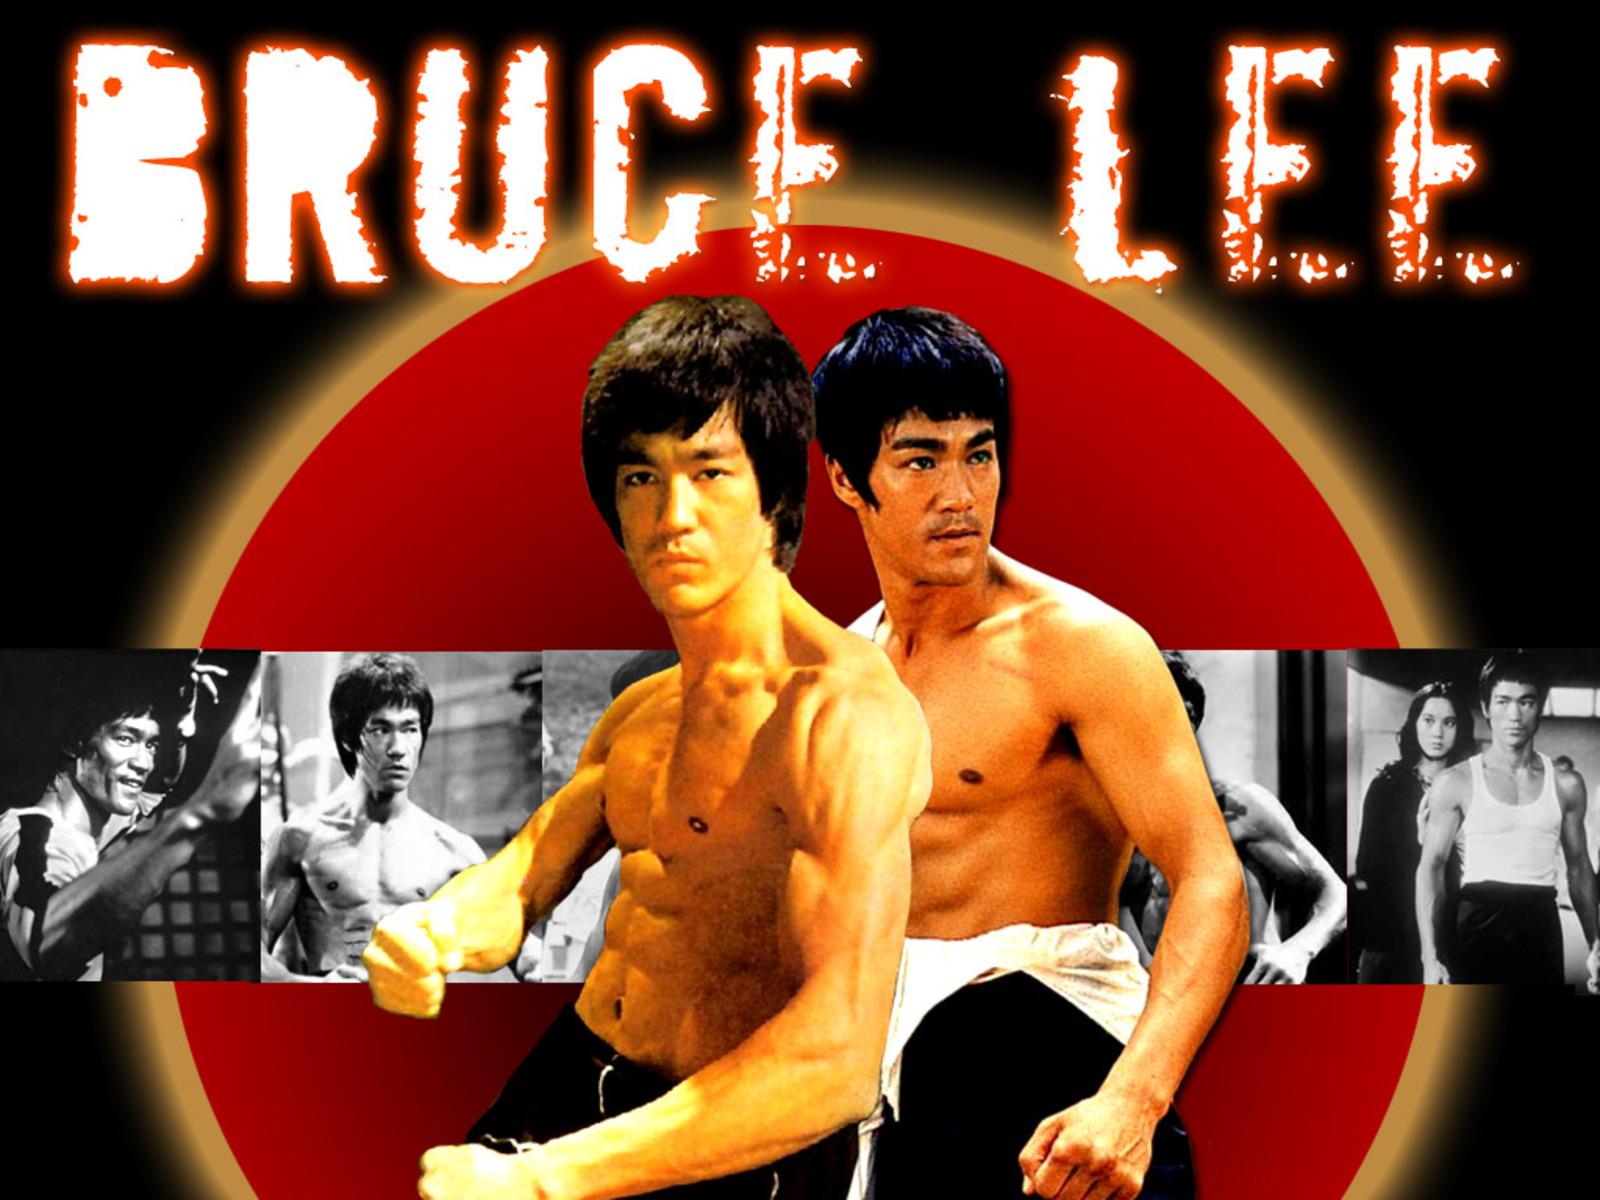 Bruce Lee Wallpaper Enter The Dragon Enter the dragon(bruce lee)